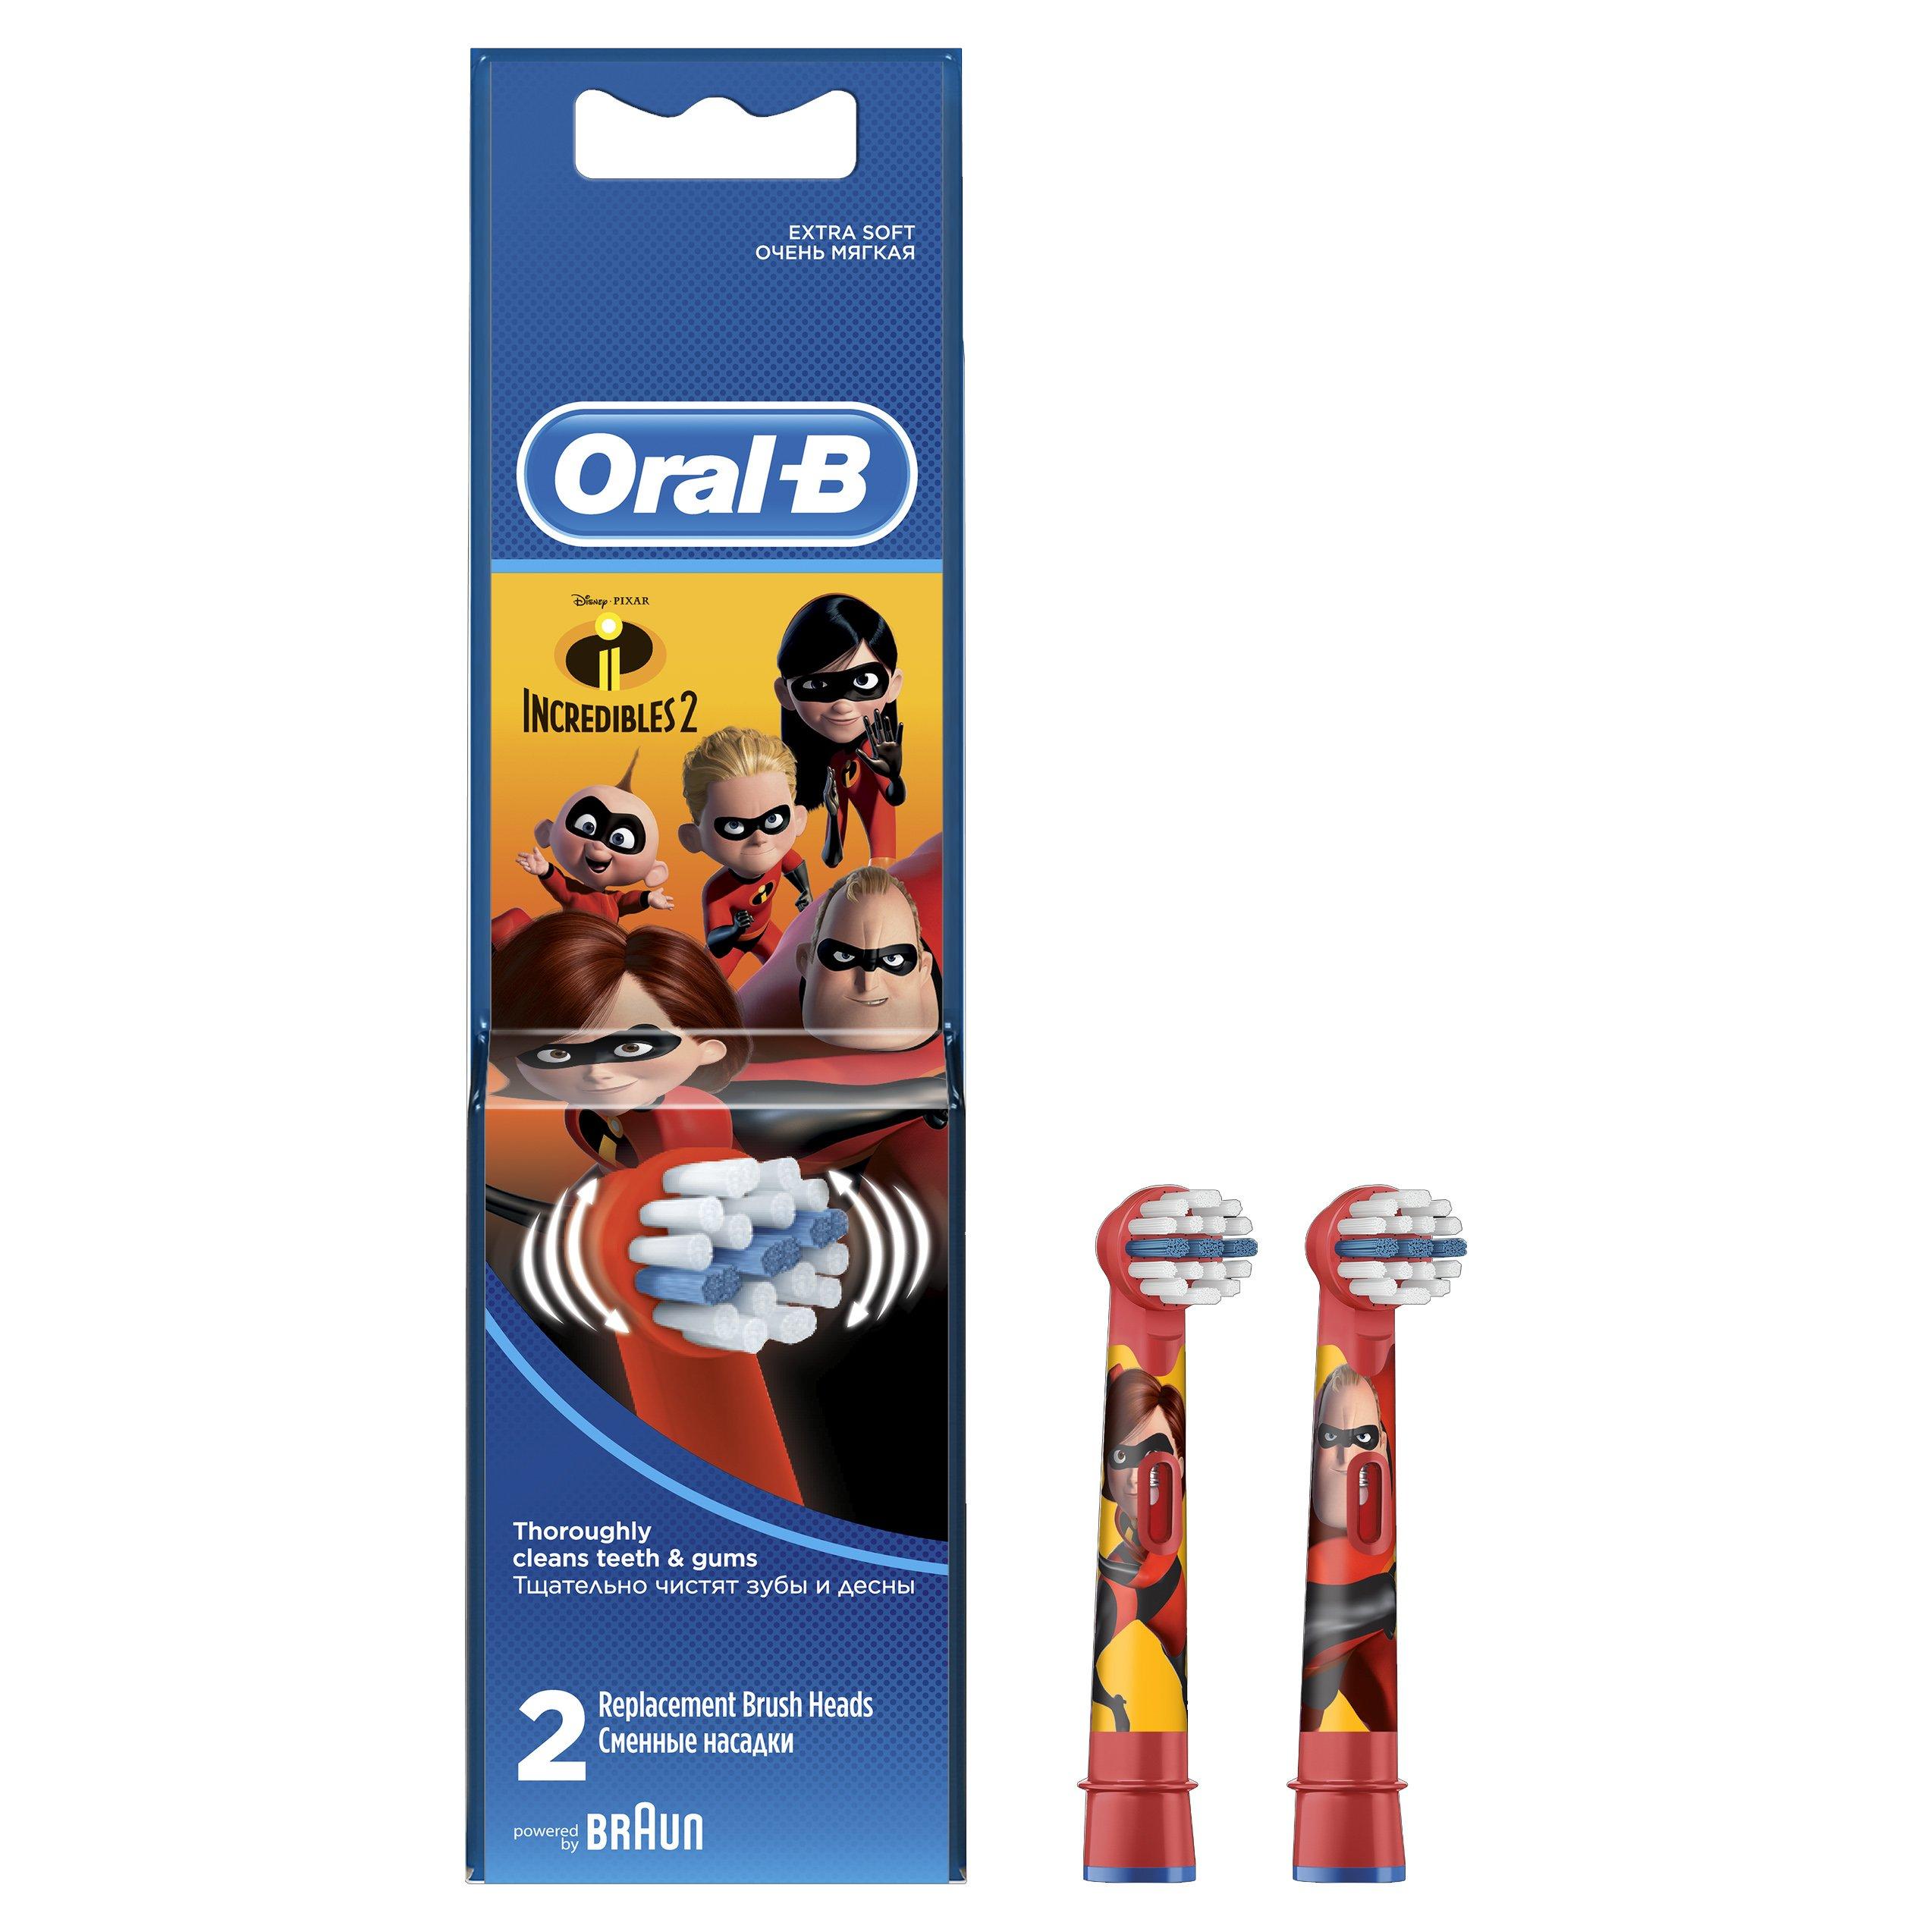 Oral-B Stages Power The Incredibles 2 Ανταλλακτικές Κεφαλές Παιδικής Οδοντόβουρτσας 2 Τεμάχια